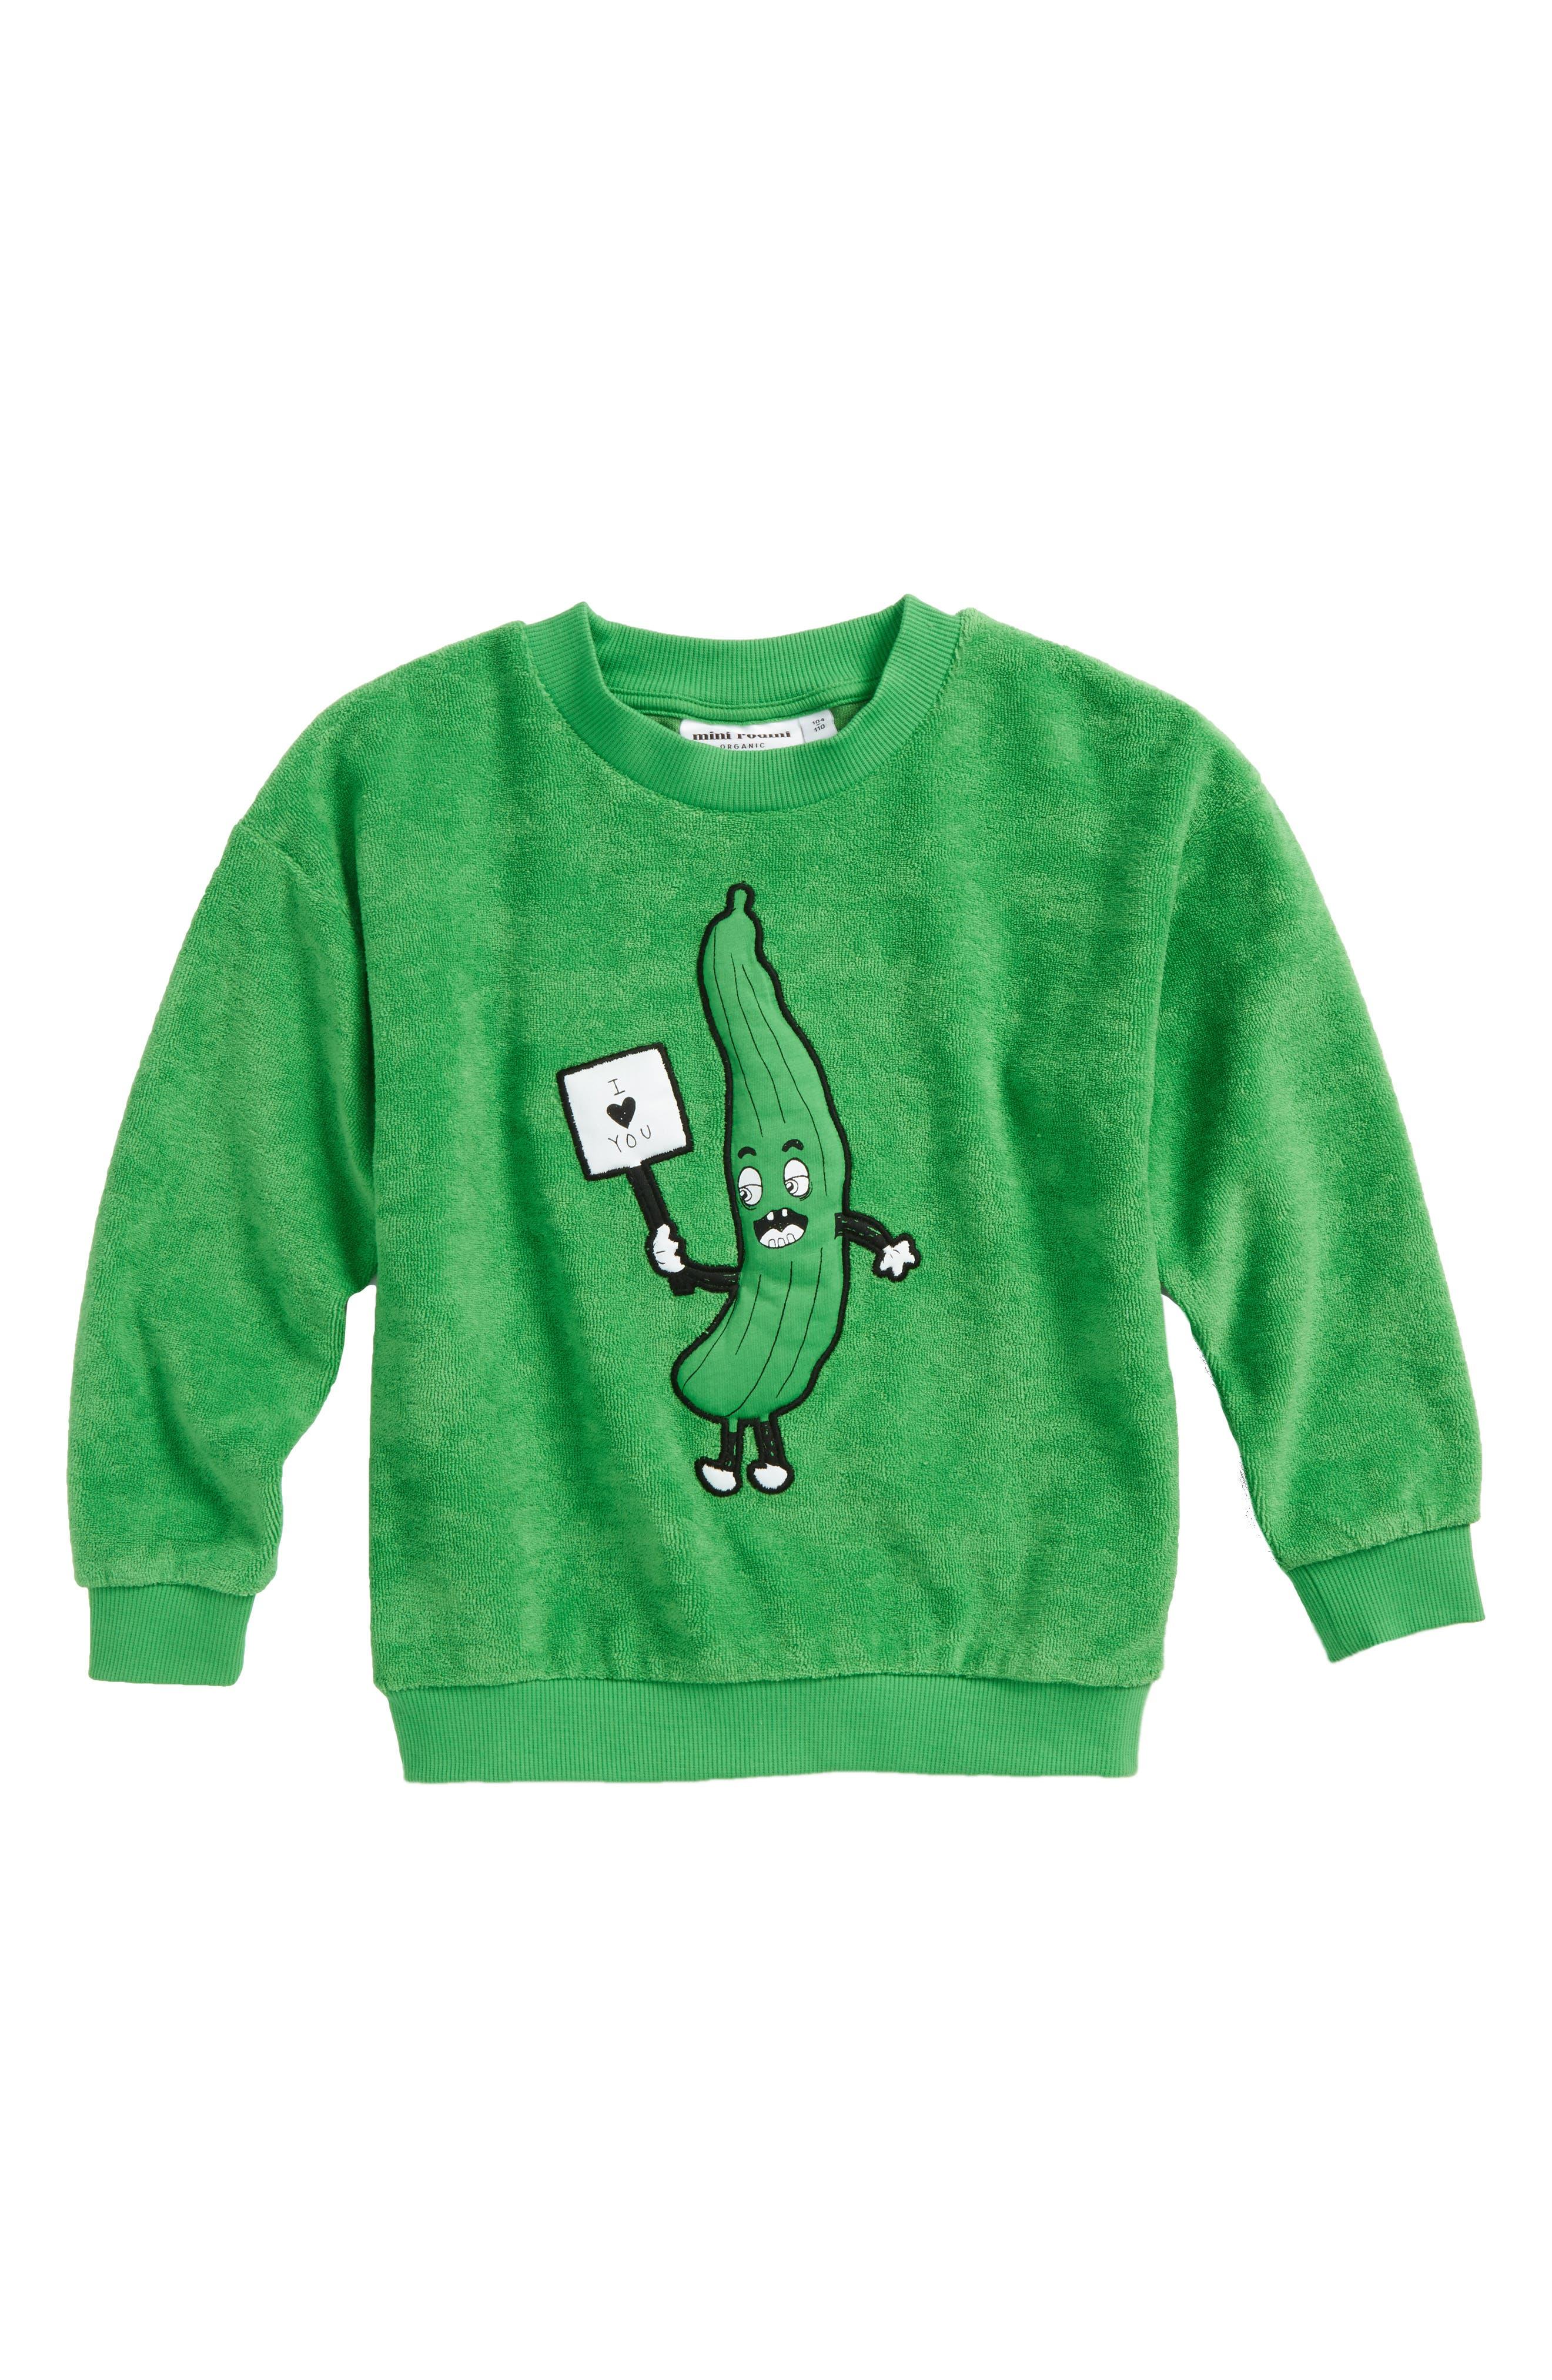 Cucumber Terry Sweatshirt,                             Main thumbnail 1, color,                             300